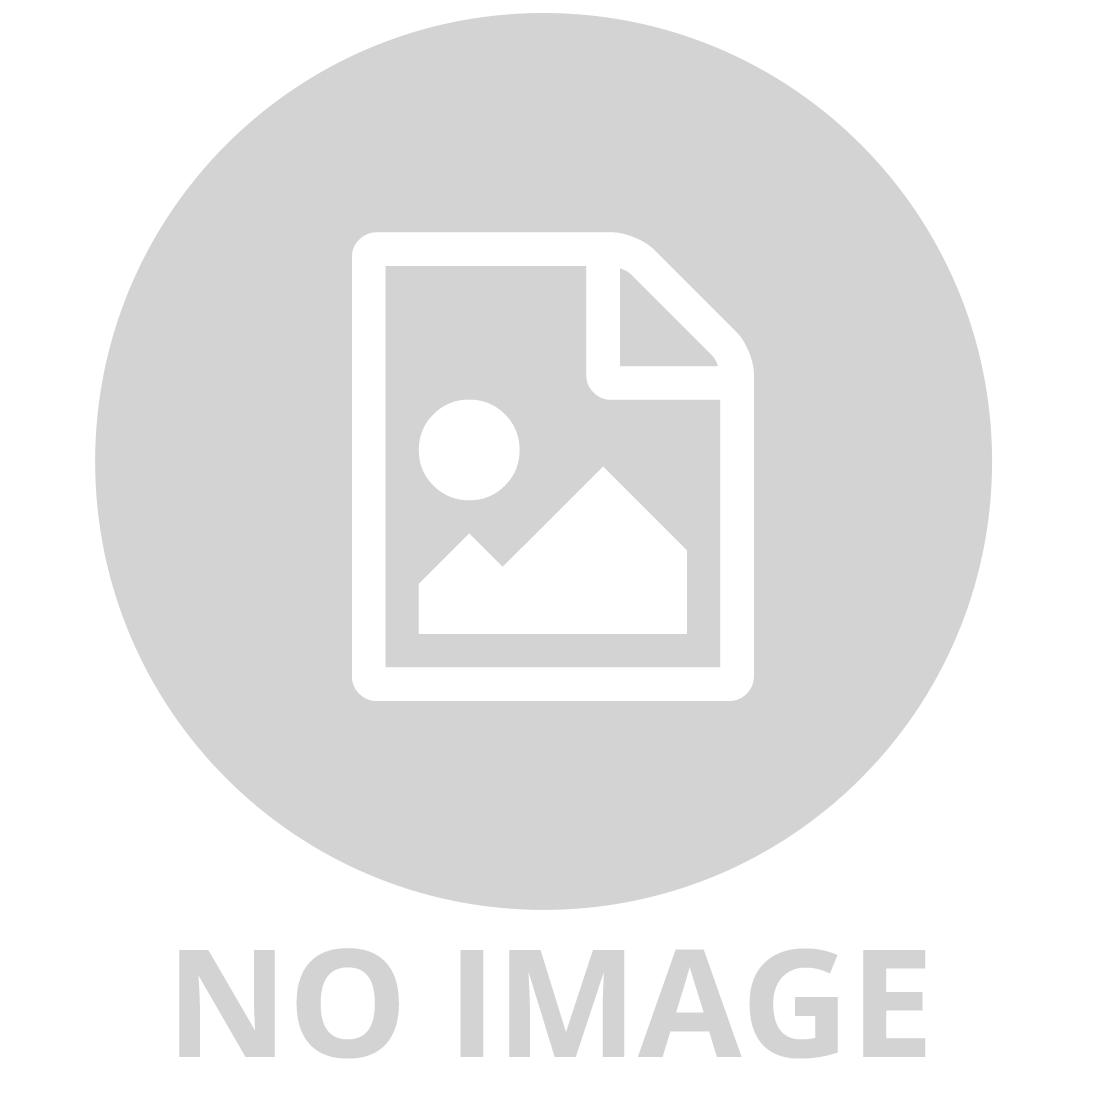 BRIO WORLD MECHANICAL SWITCHES